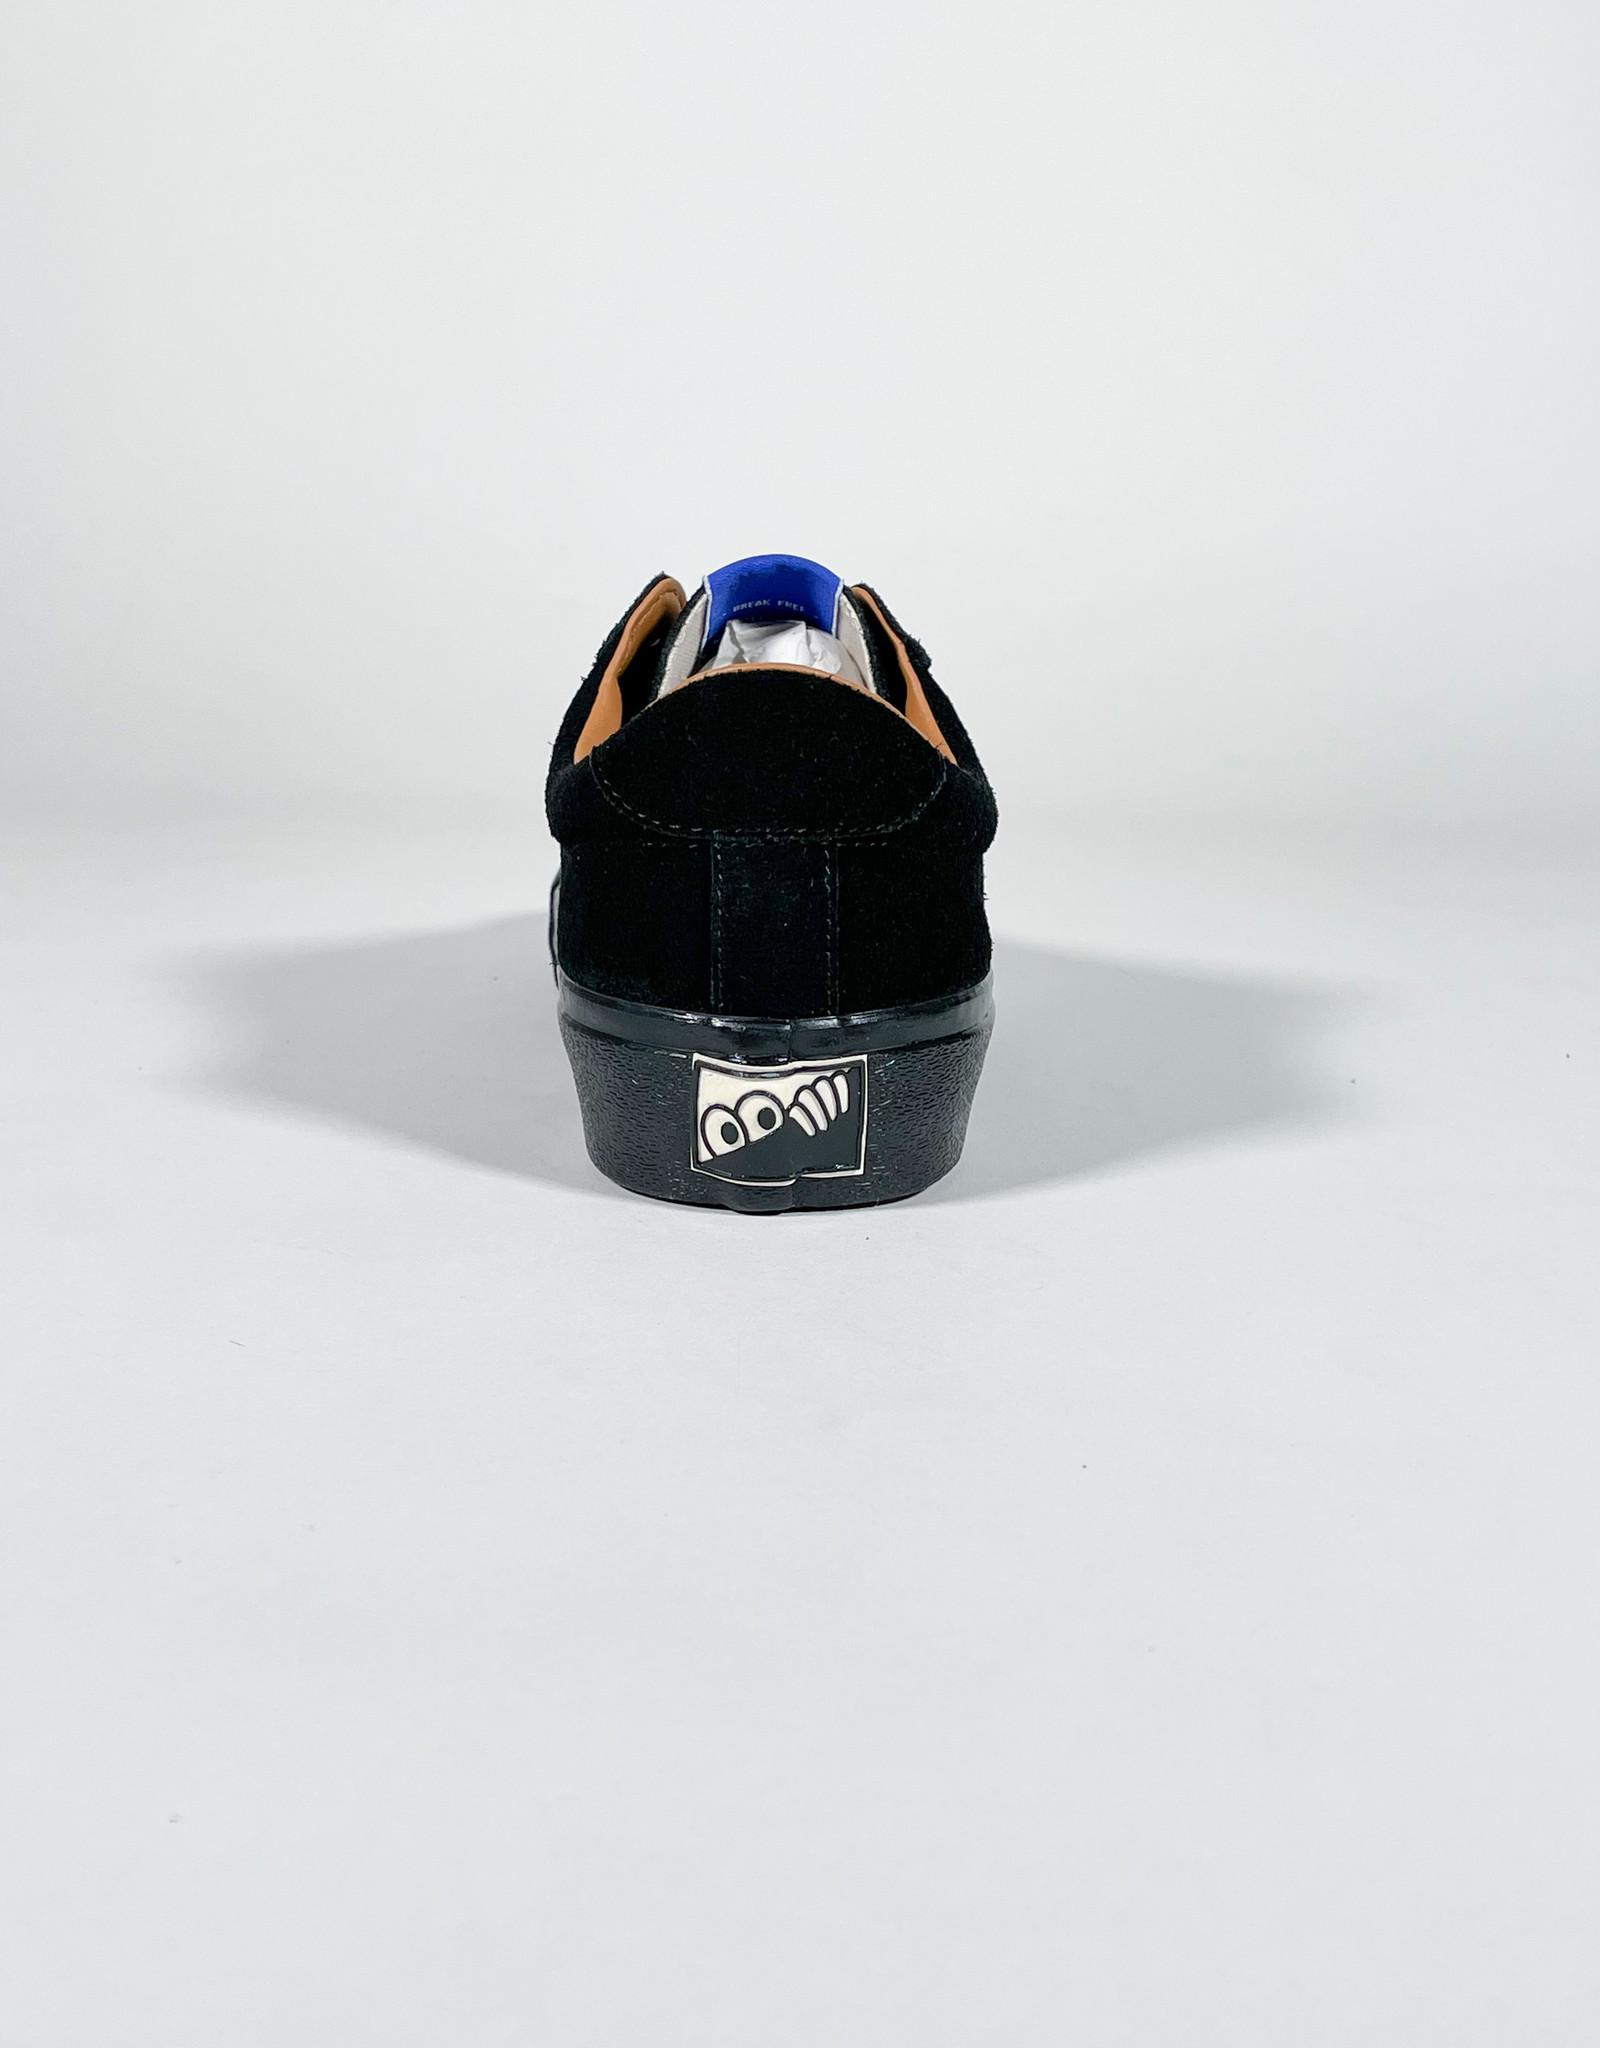 LAST RESORT LAST RESORT VM001 LO - SUEDE BLACK/BLACK